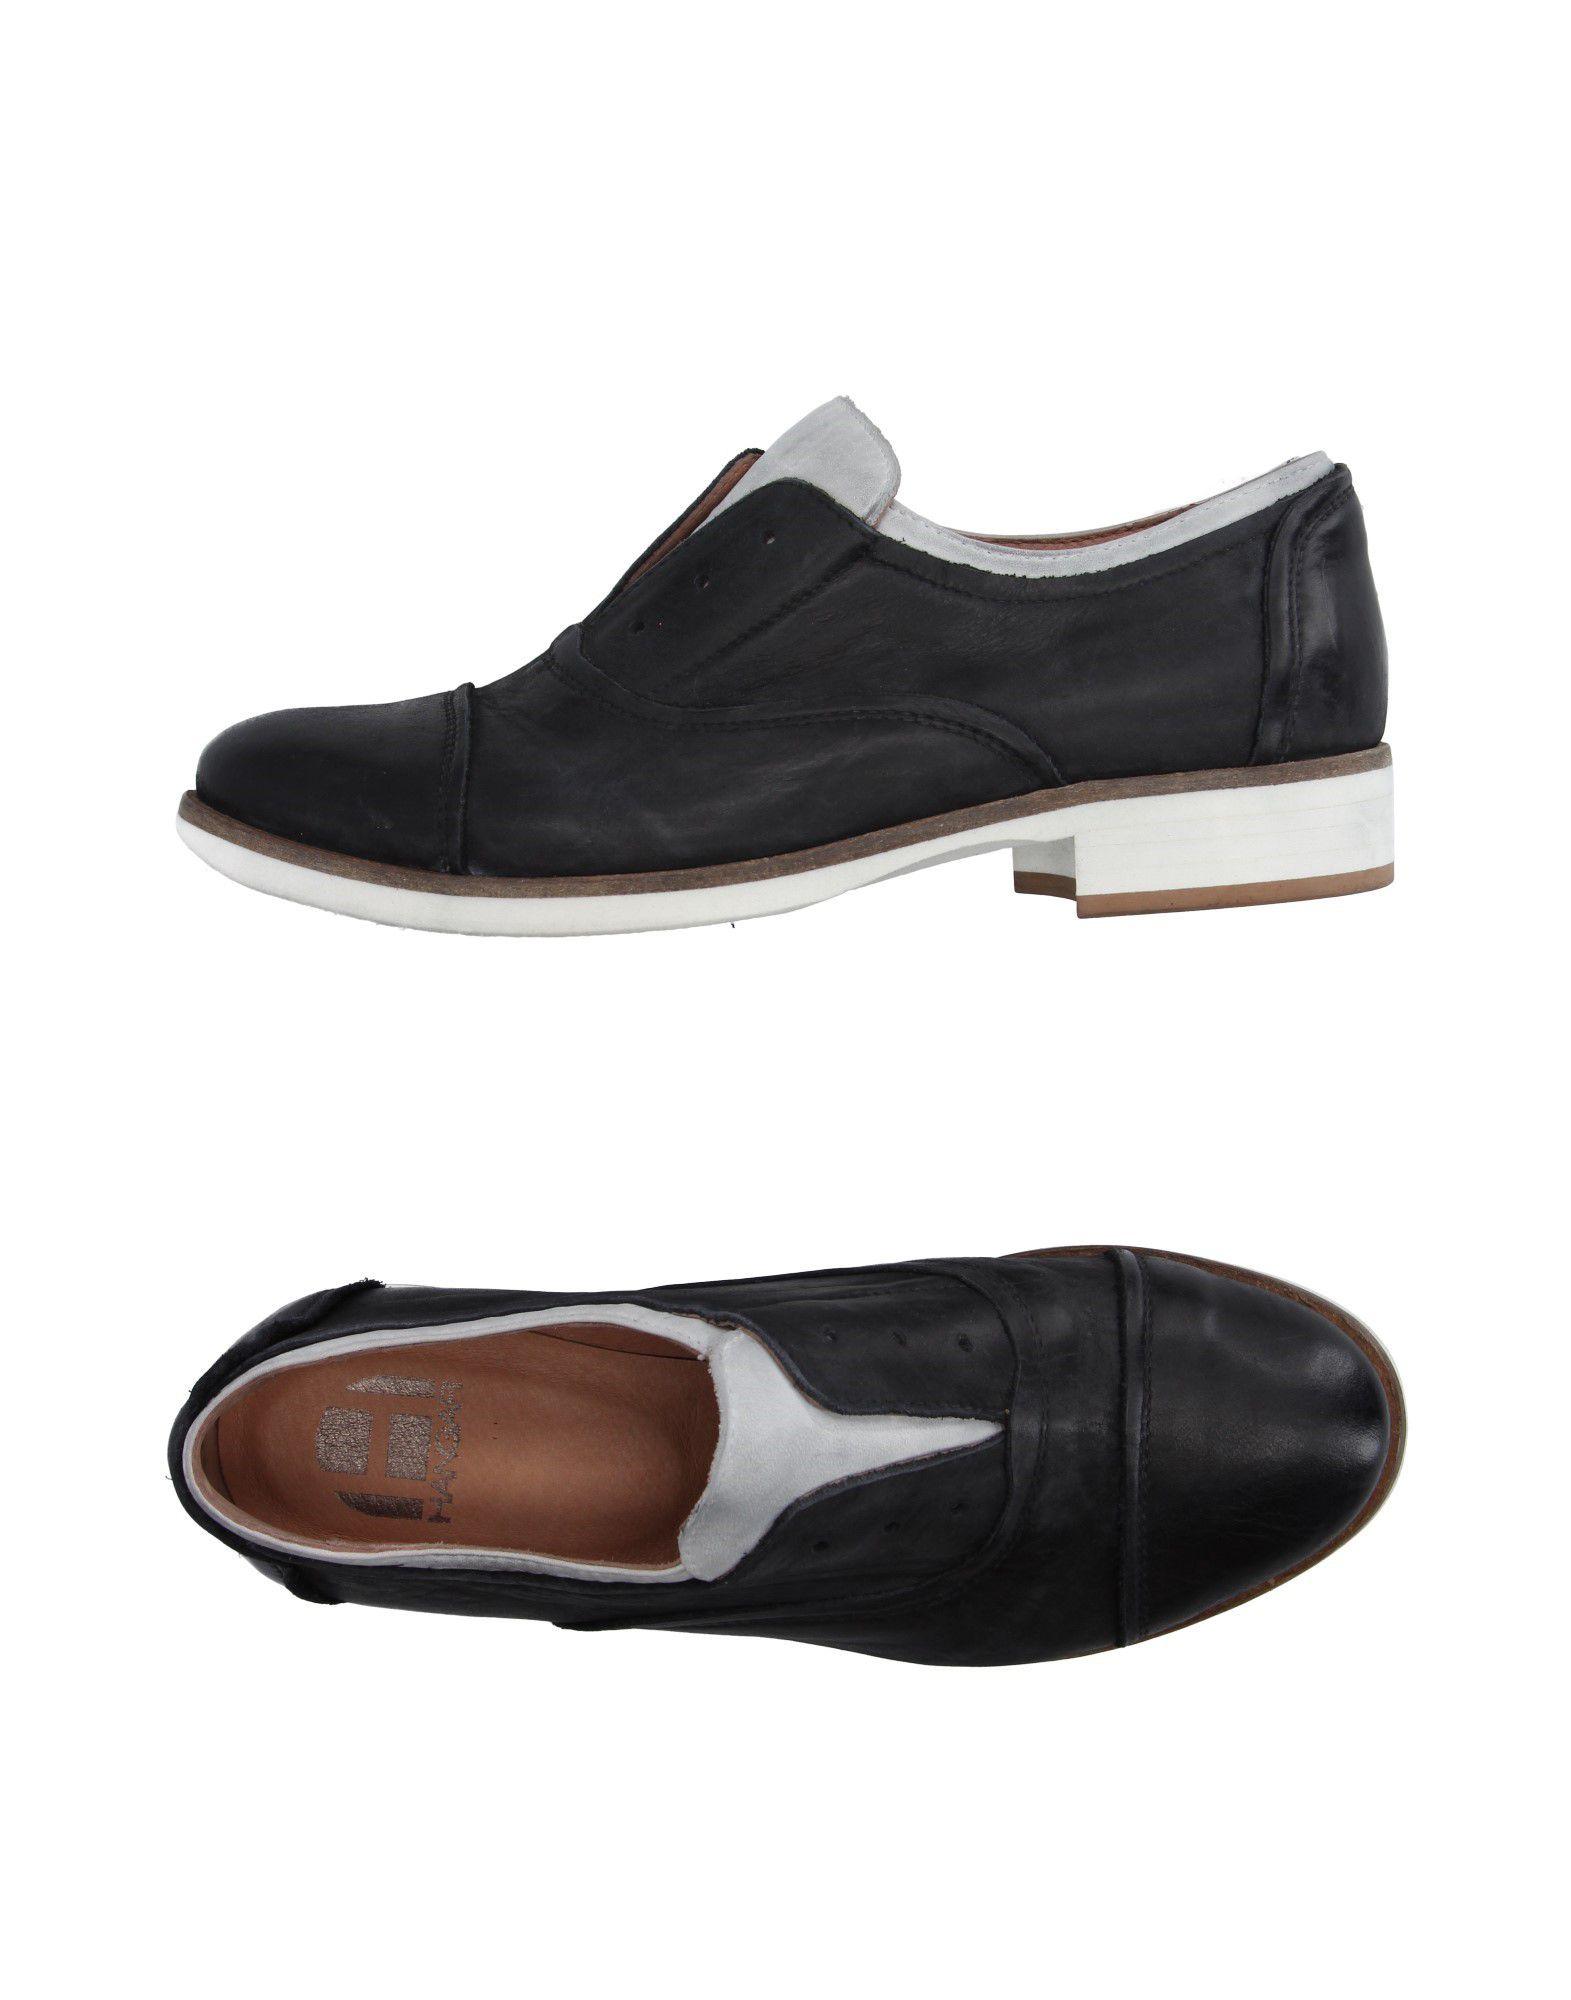 Sneakers Pollini Donna - scarpe 11447881RN Nuove offerte e scarpe - comode 151de6